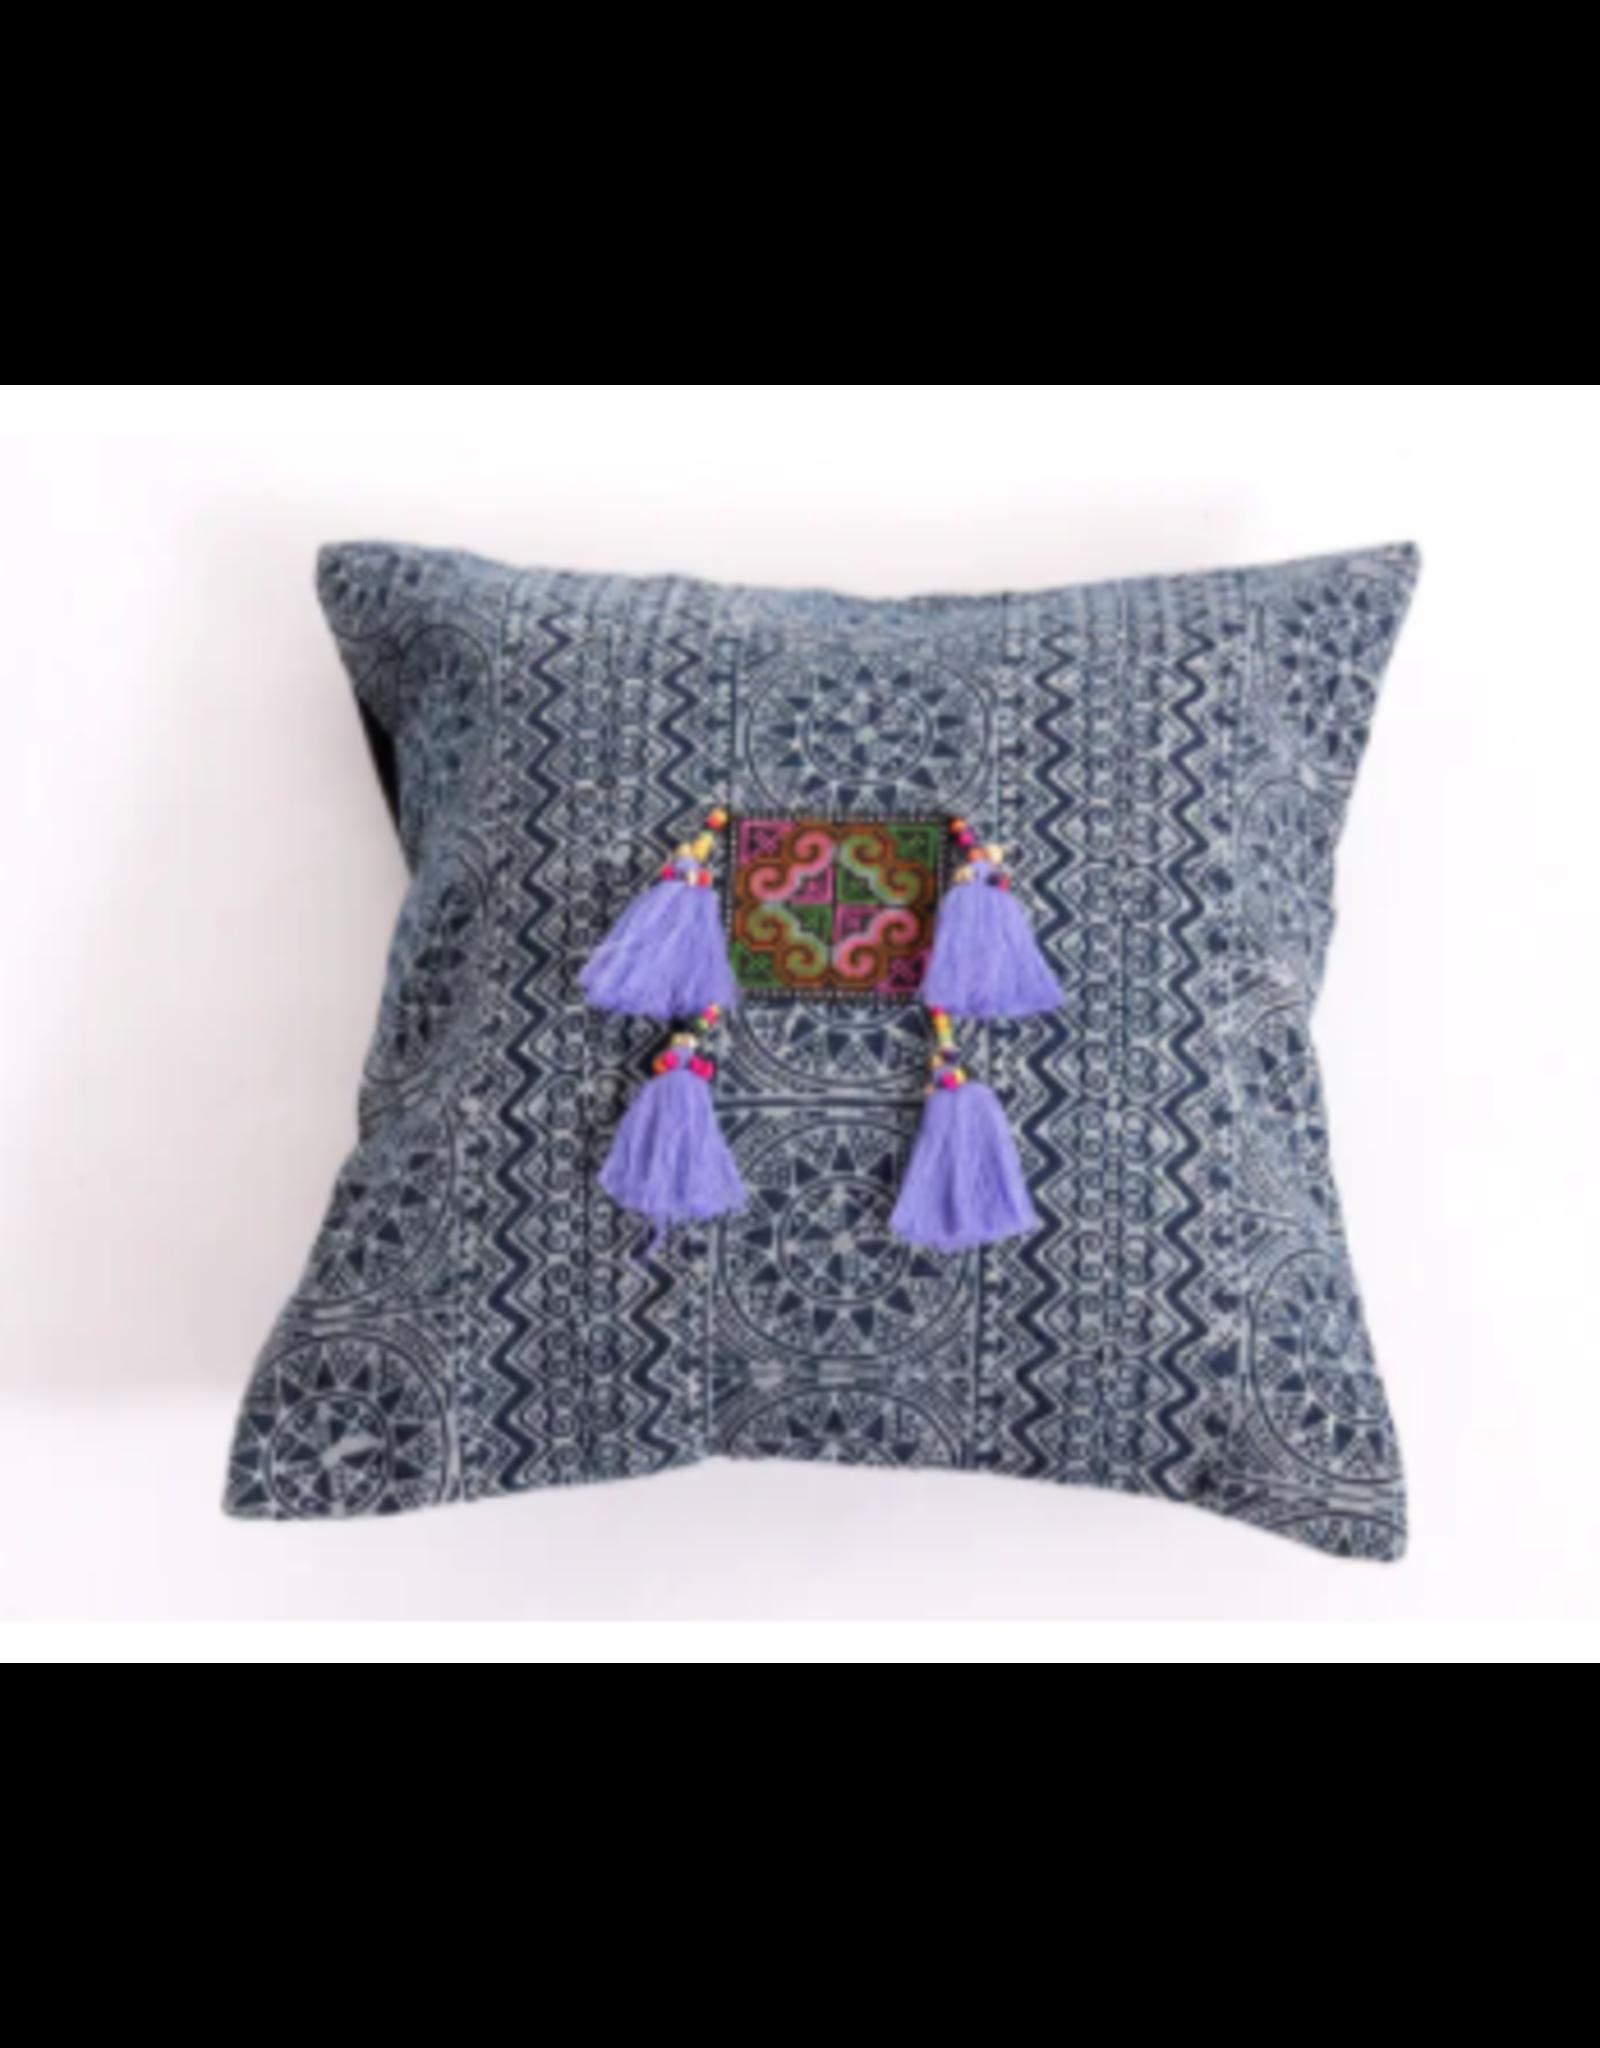 Hill Tribe Block Print Cotton Pillow Case, w/ Tassels